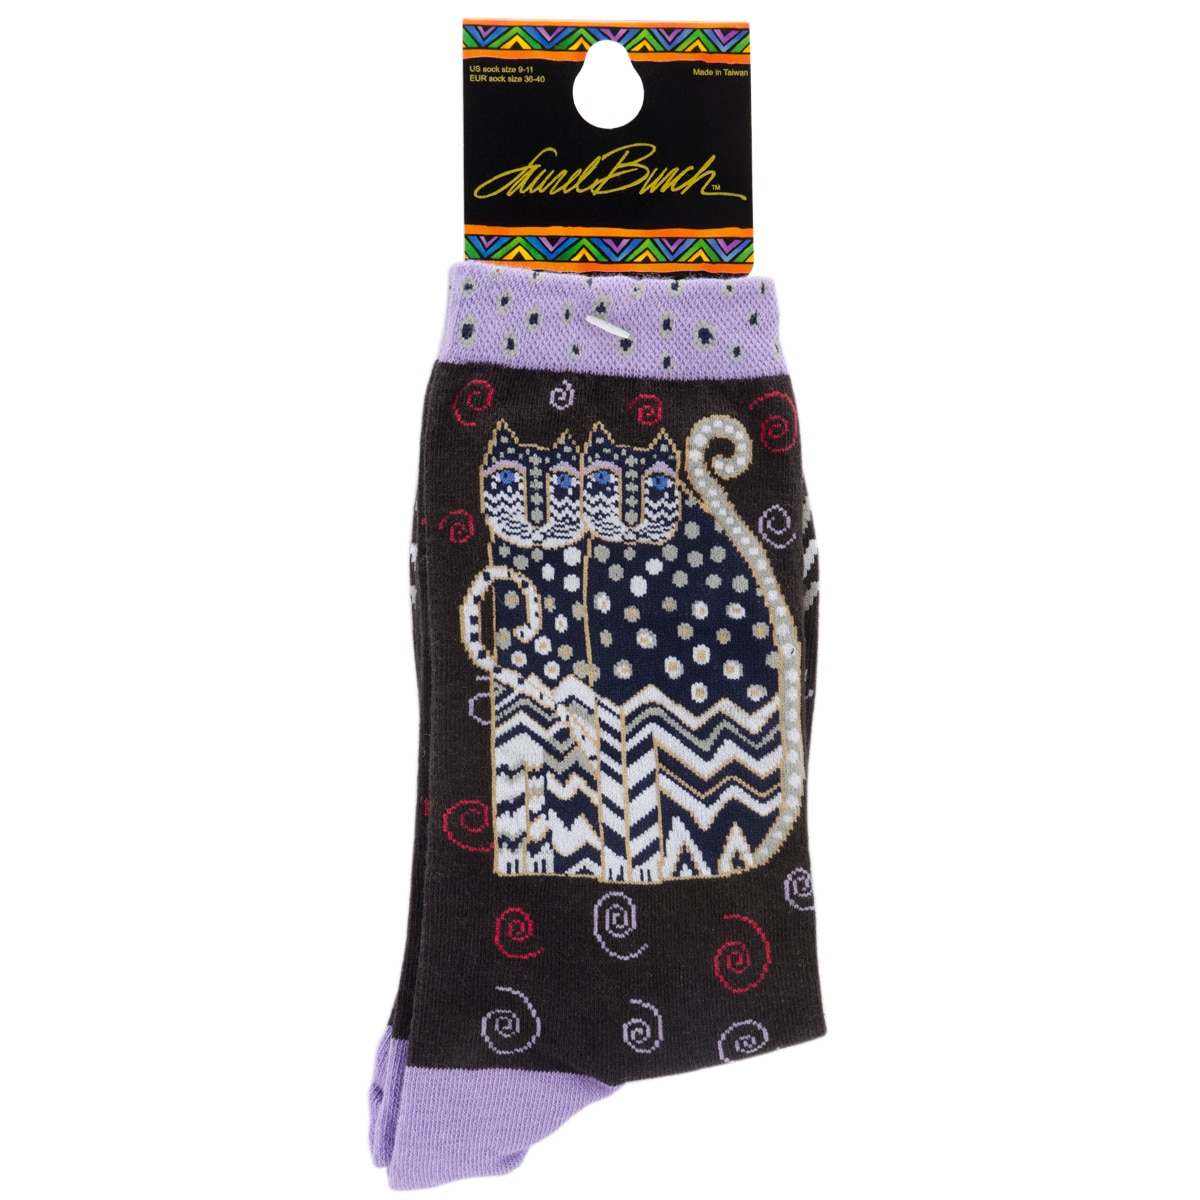 Laurel Burch Socks-Polka Dot Gatos